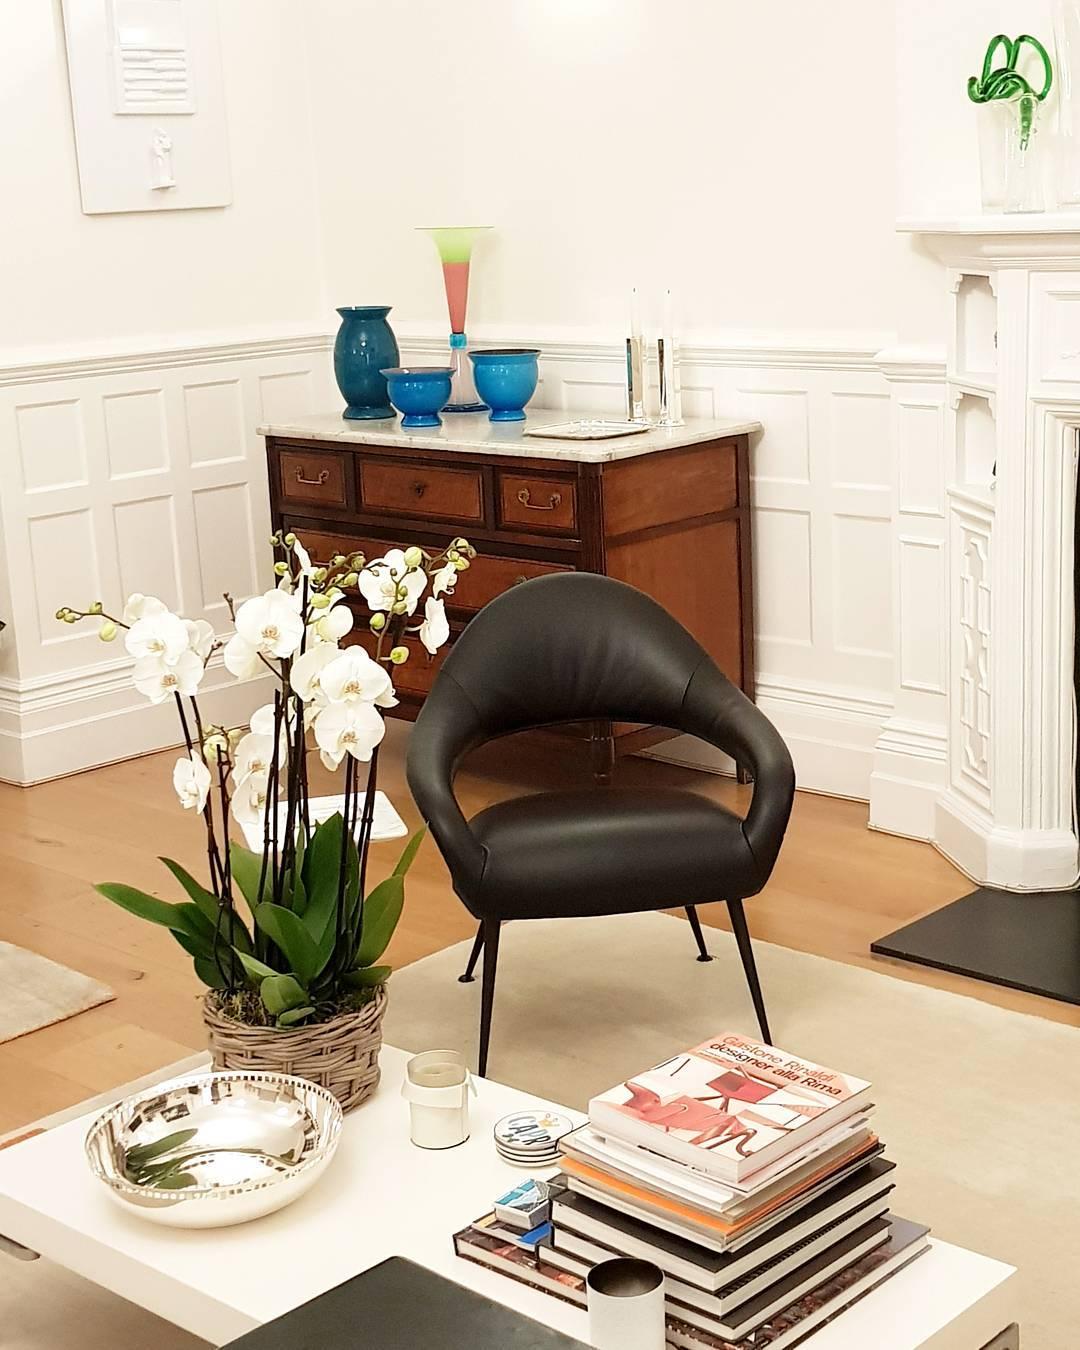 letizia poltrona frau - stile vintage arredamento